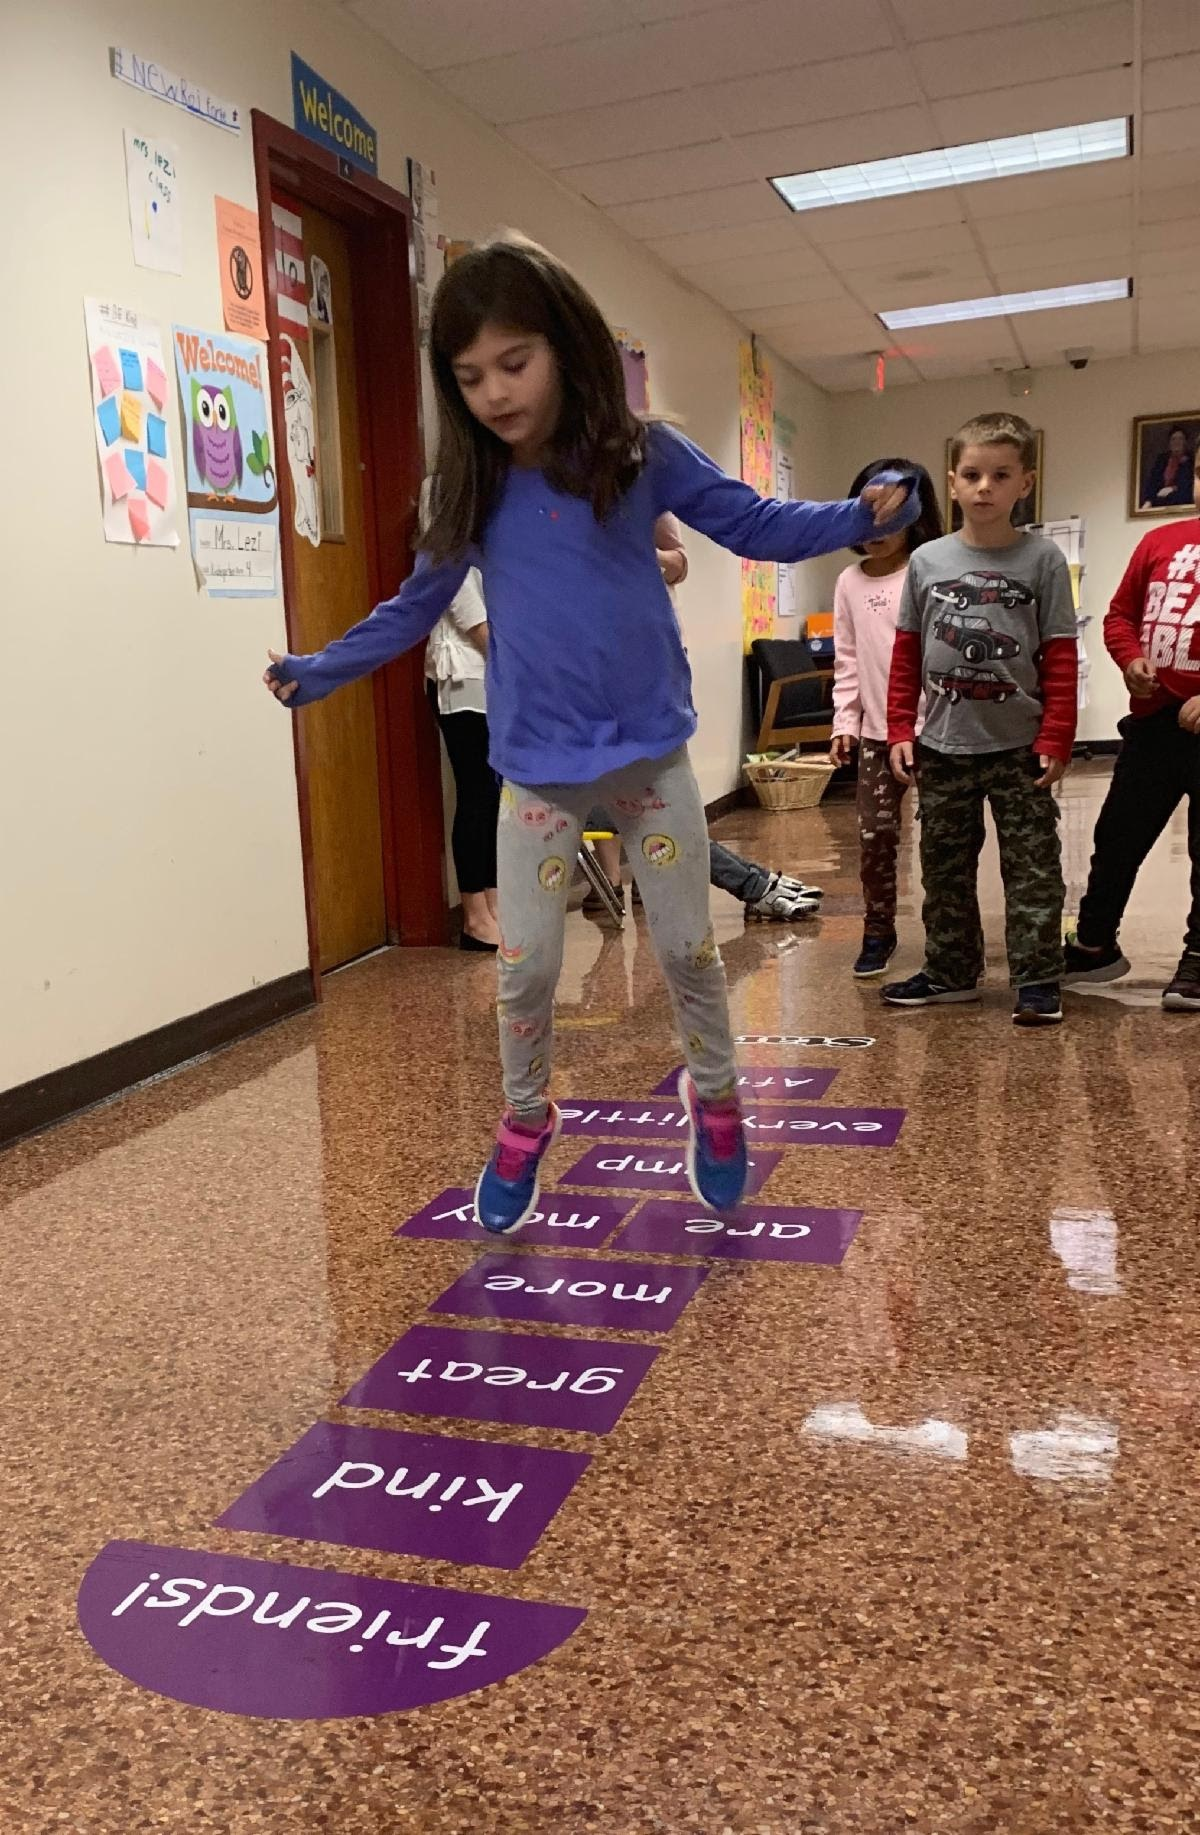 Sensory hallway activities at Ward Elementary